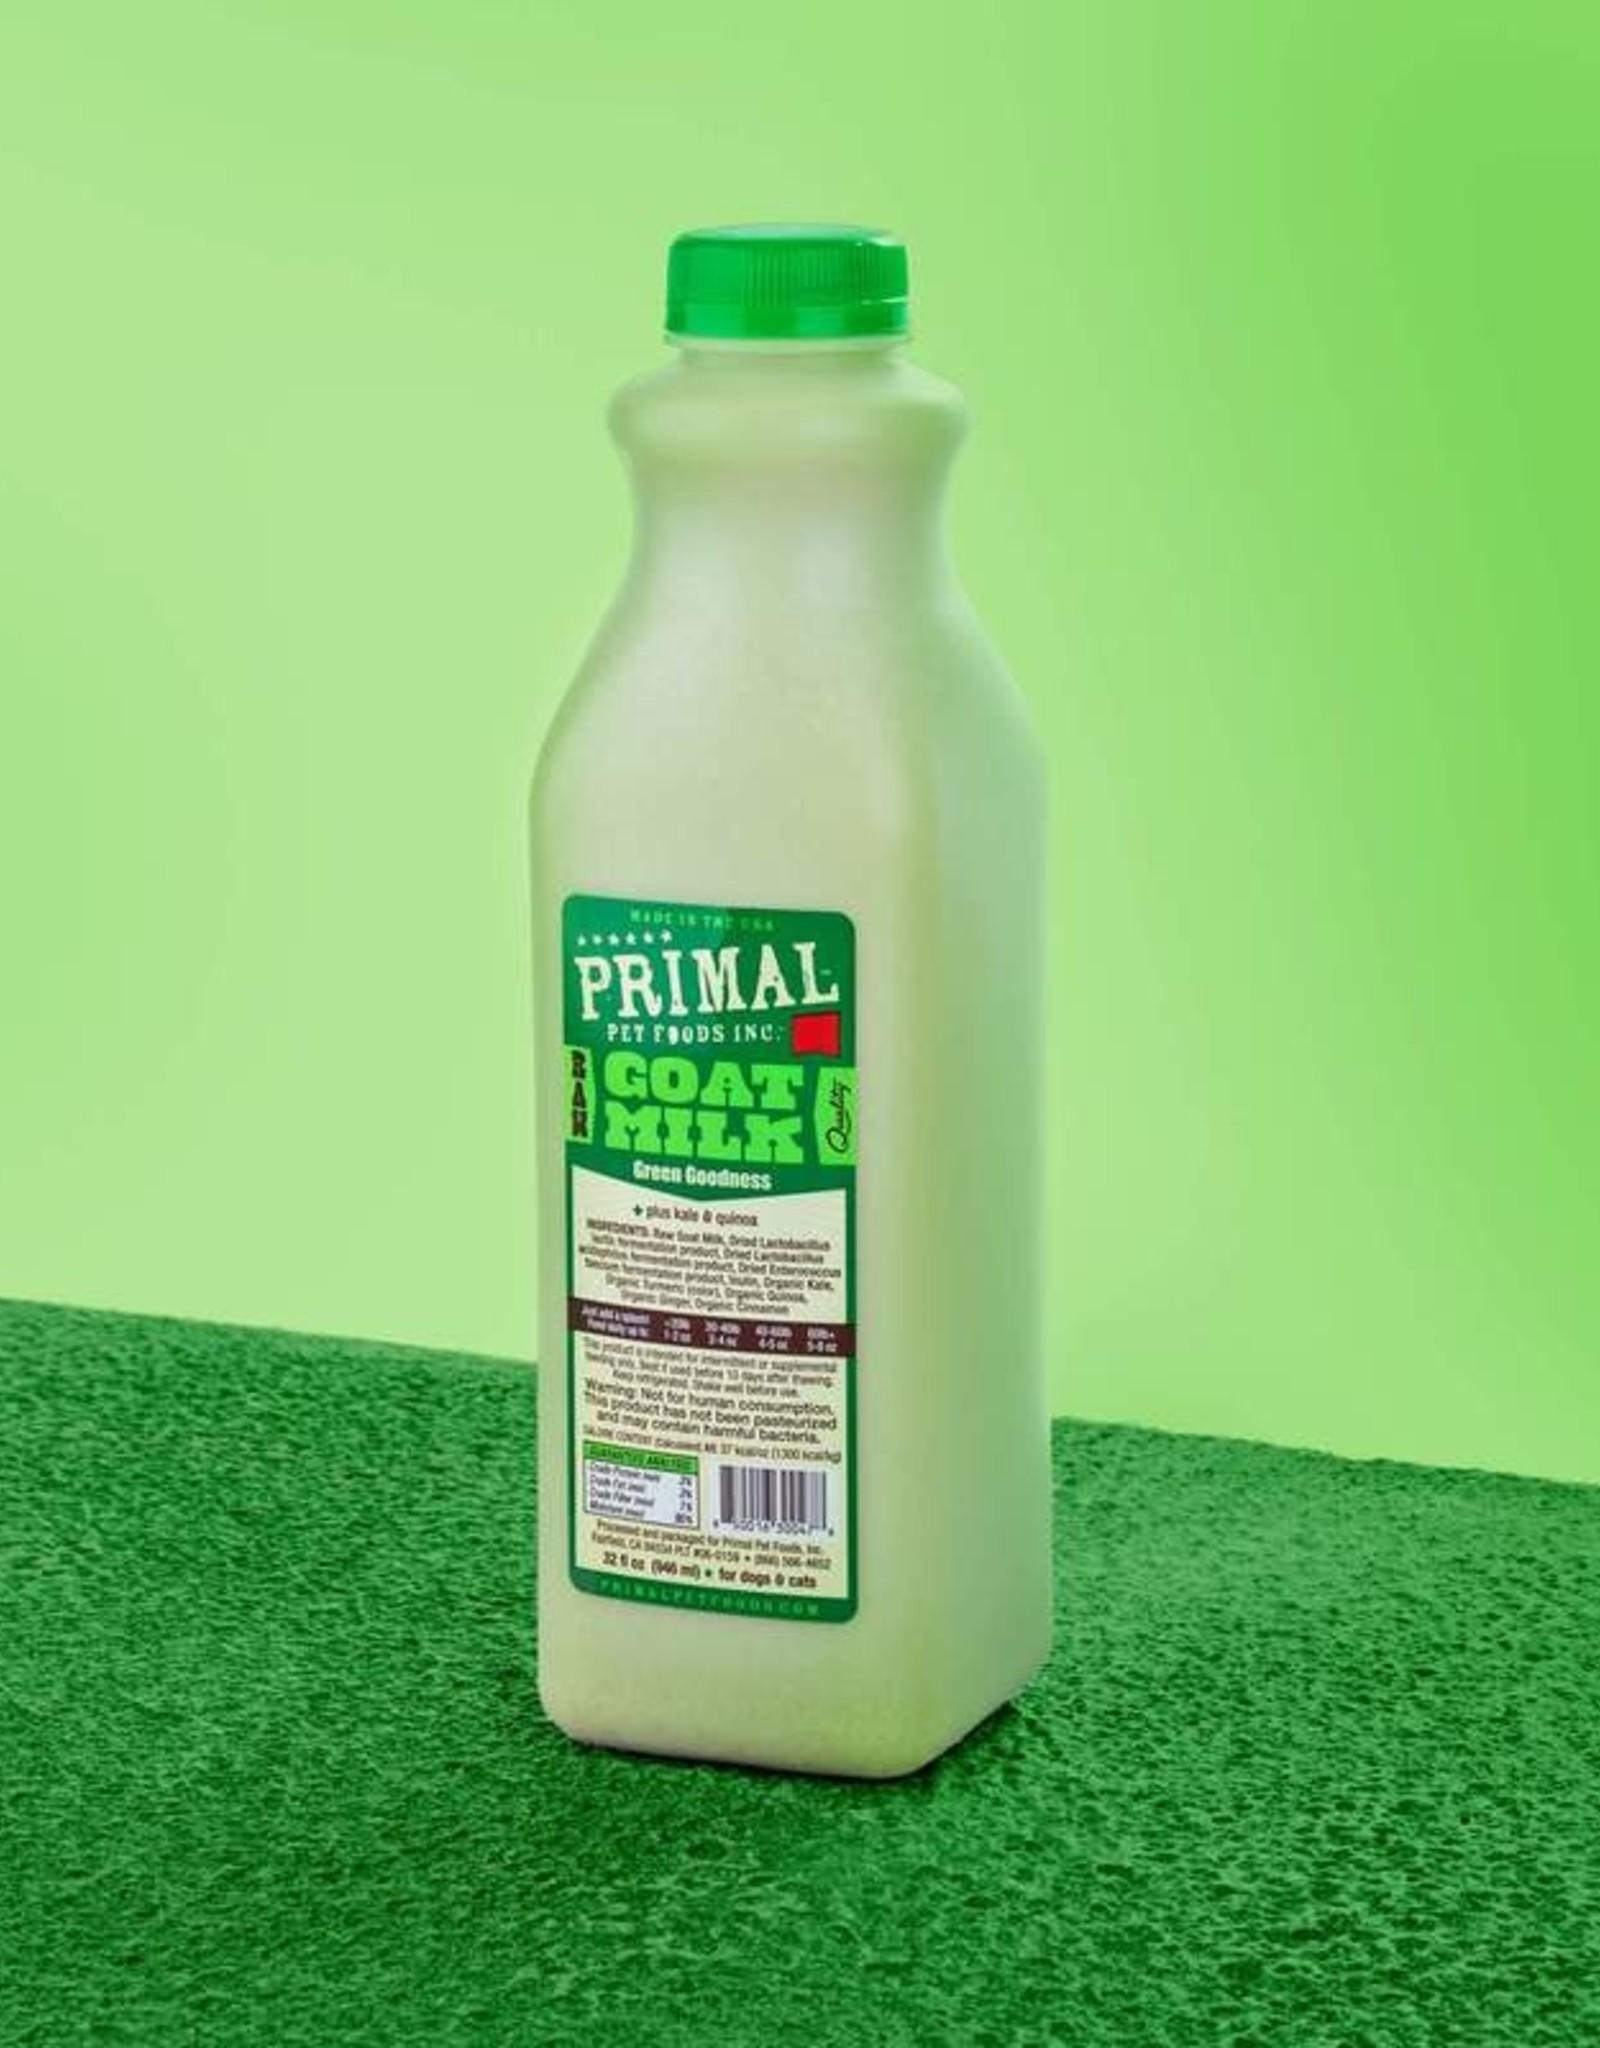 Primal Green Goodness Goat Milk 32oz